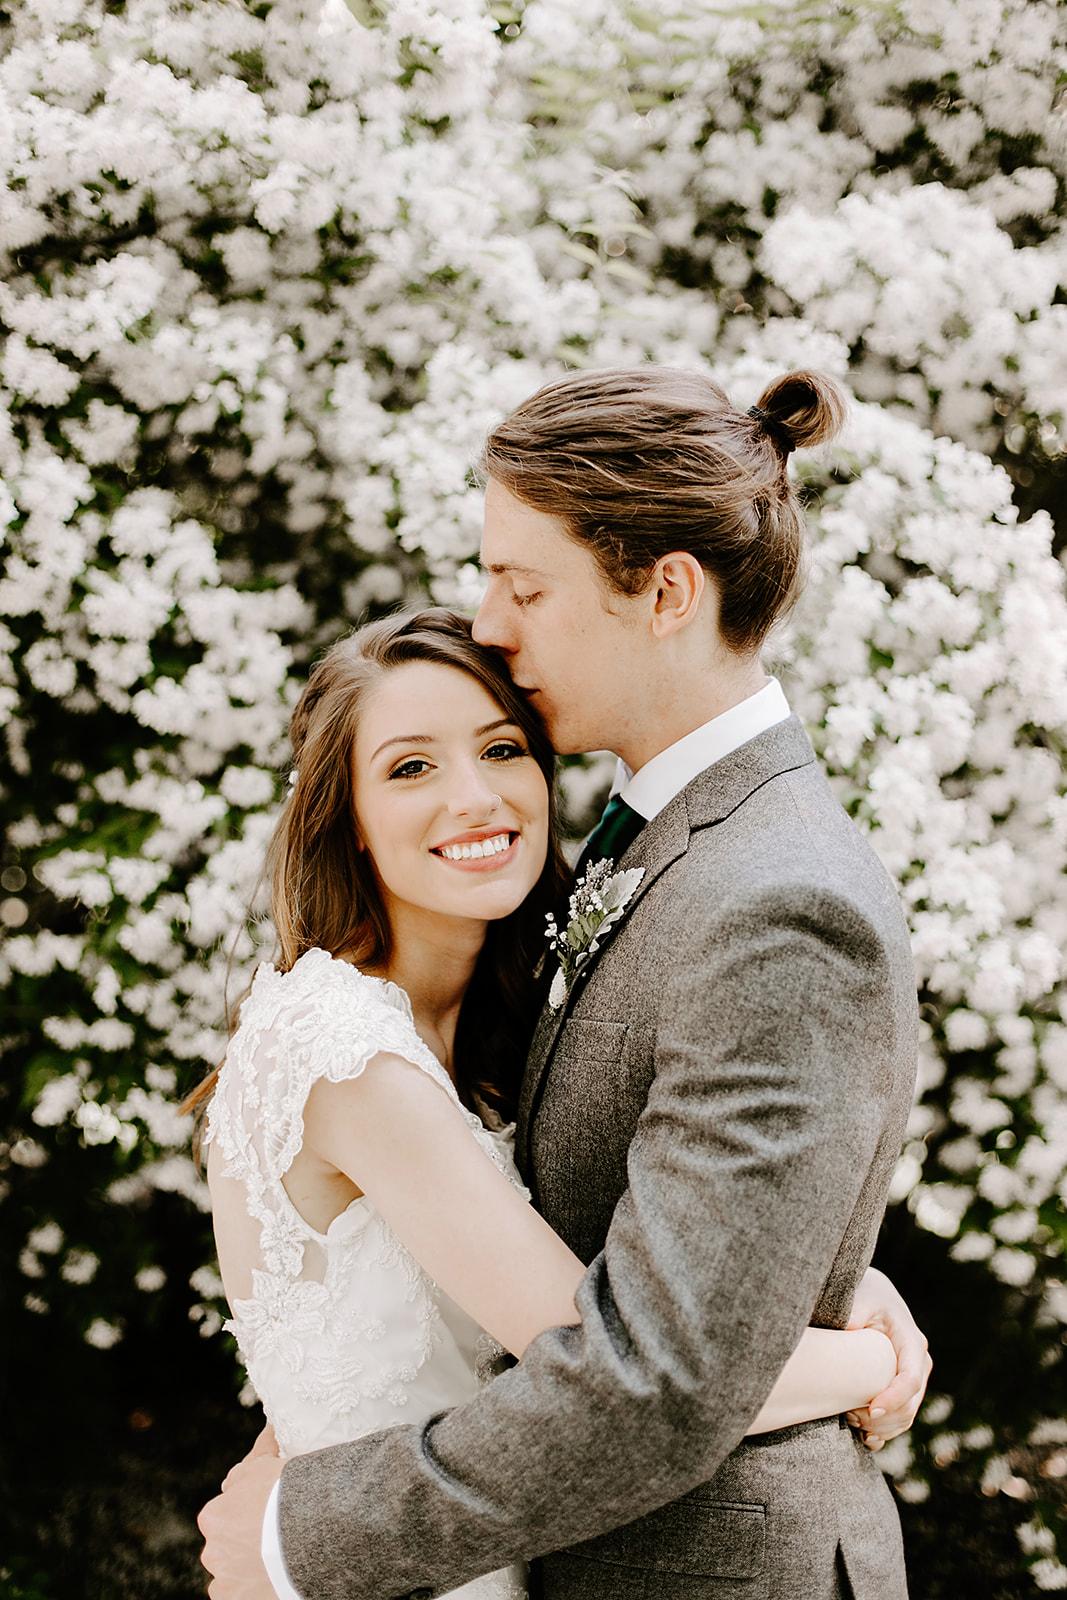 Lily and Easton Wedding Carmel Indiana Cool Creek Park Grace Church Emily Elyse Wehner Photography -183.jpg